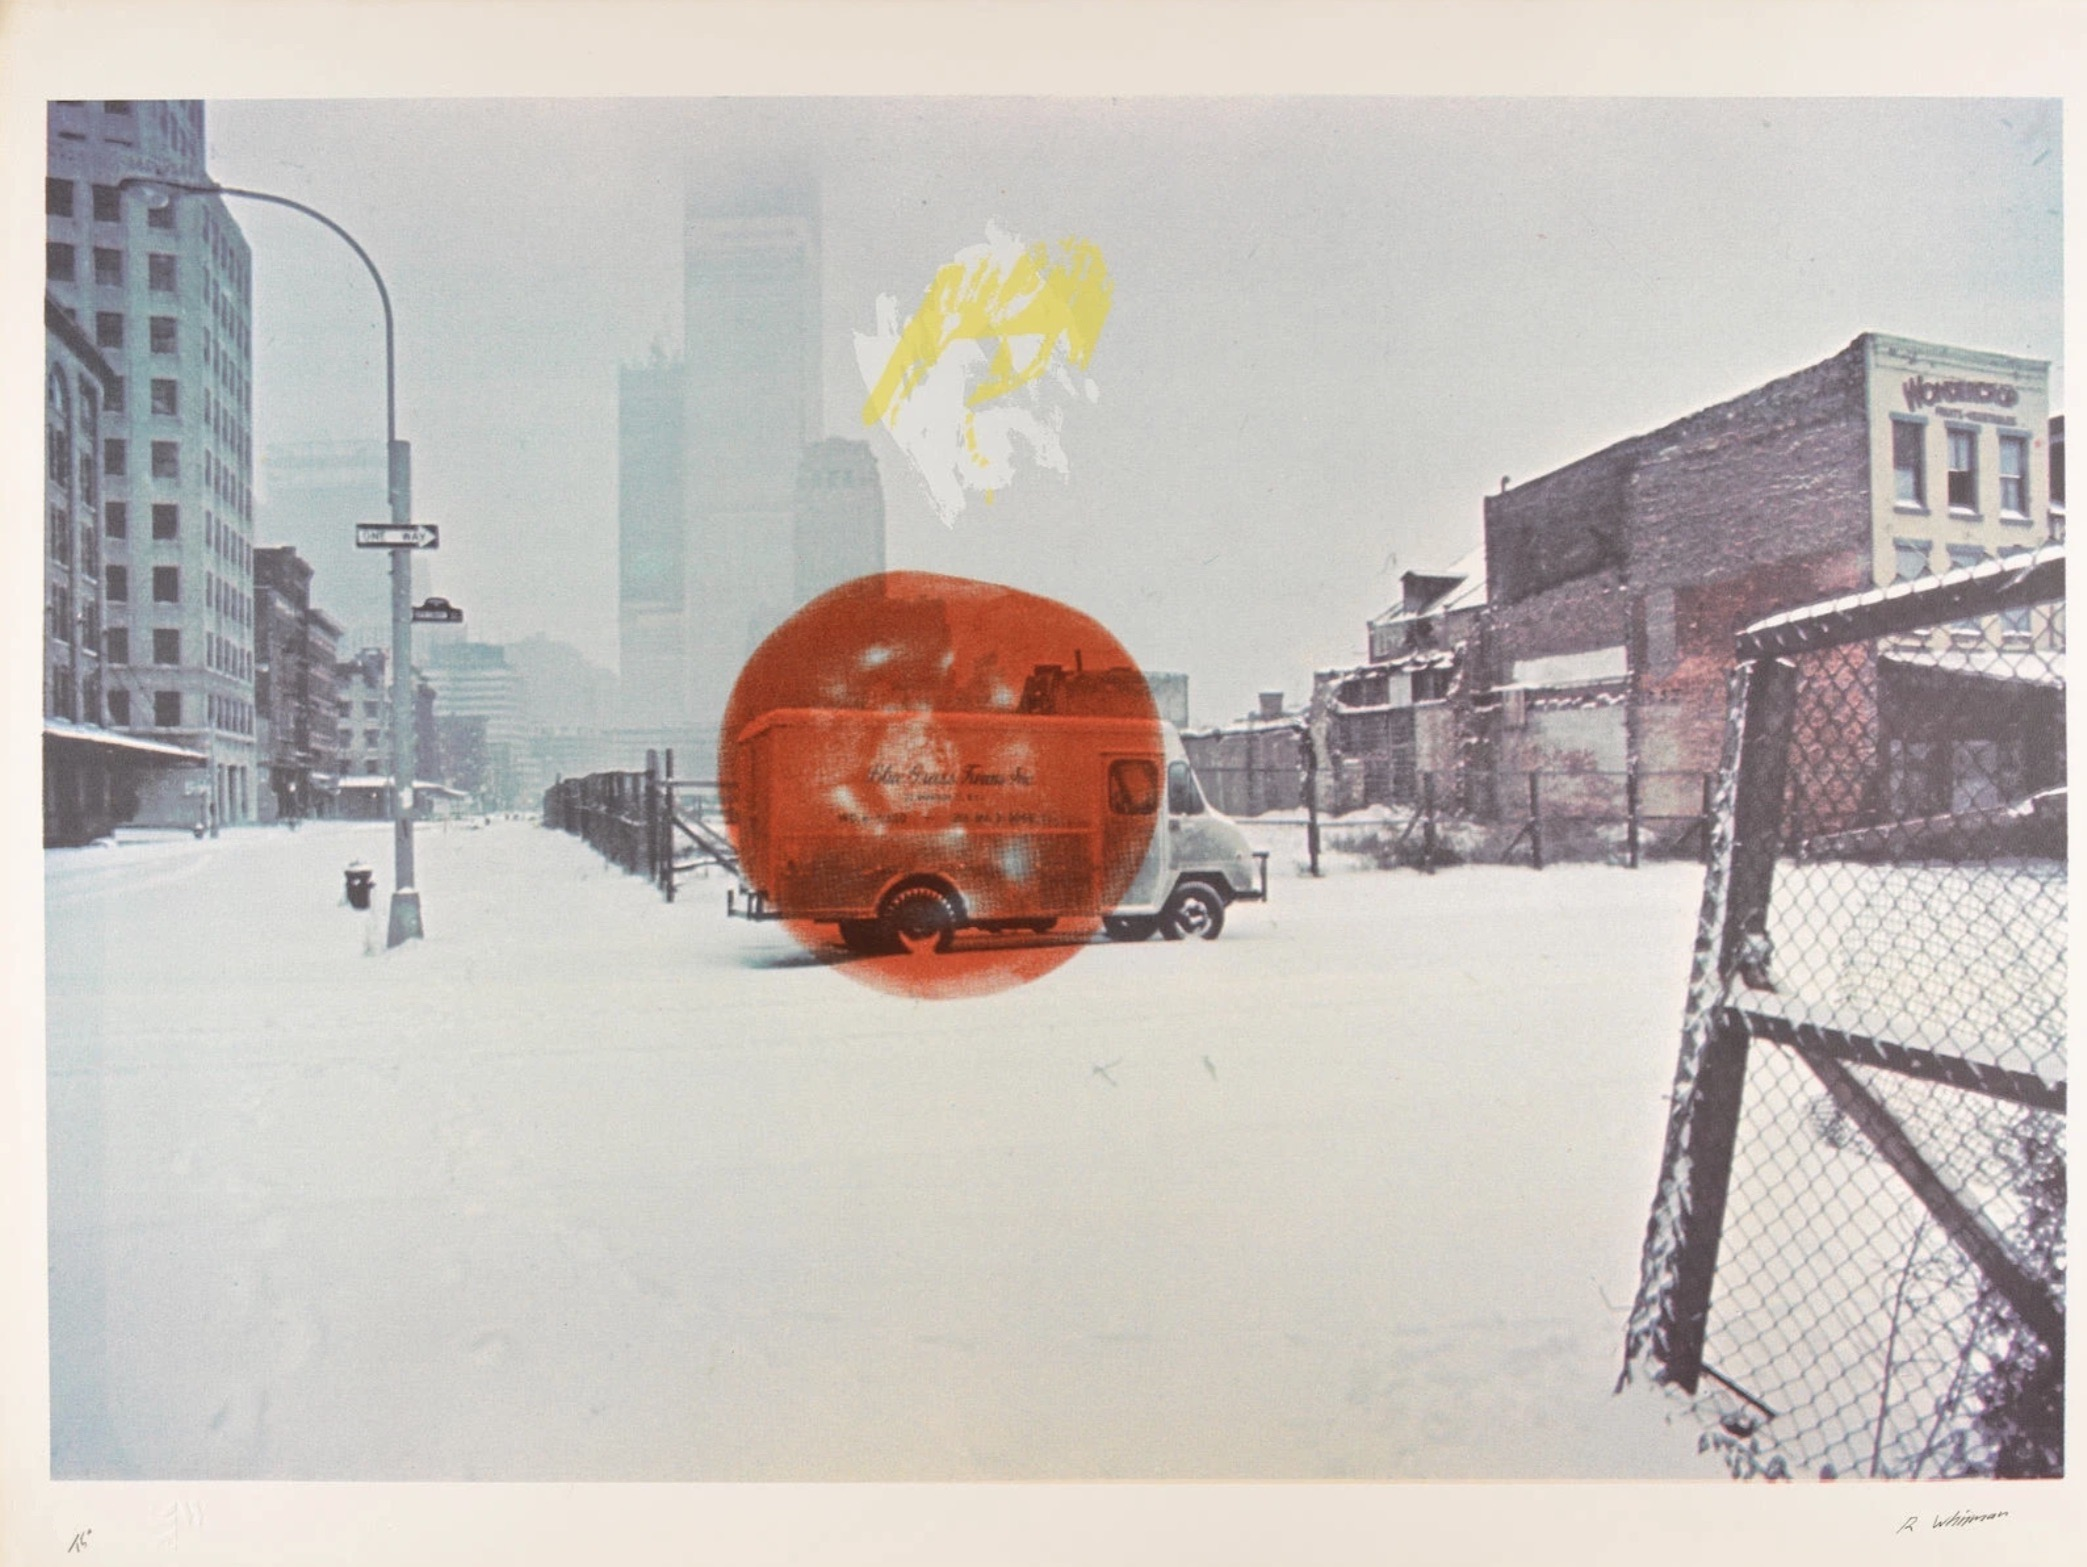 Untitled by Robert Whitman